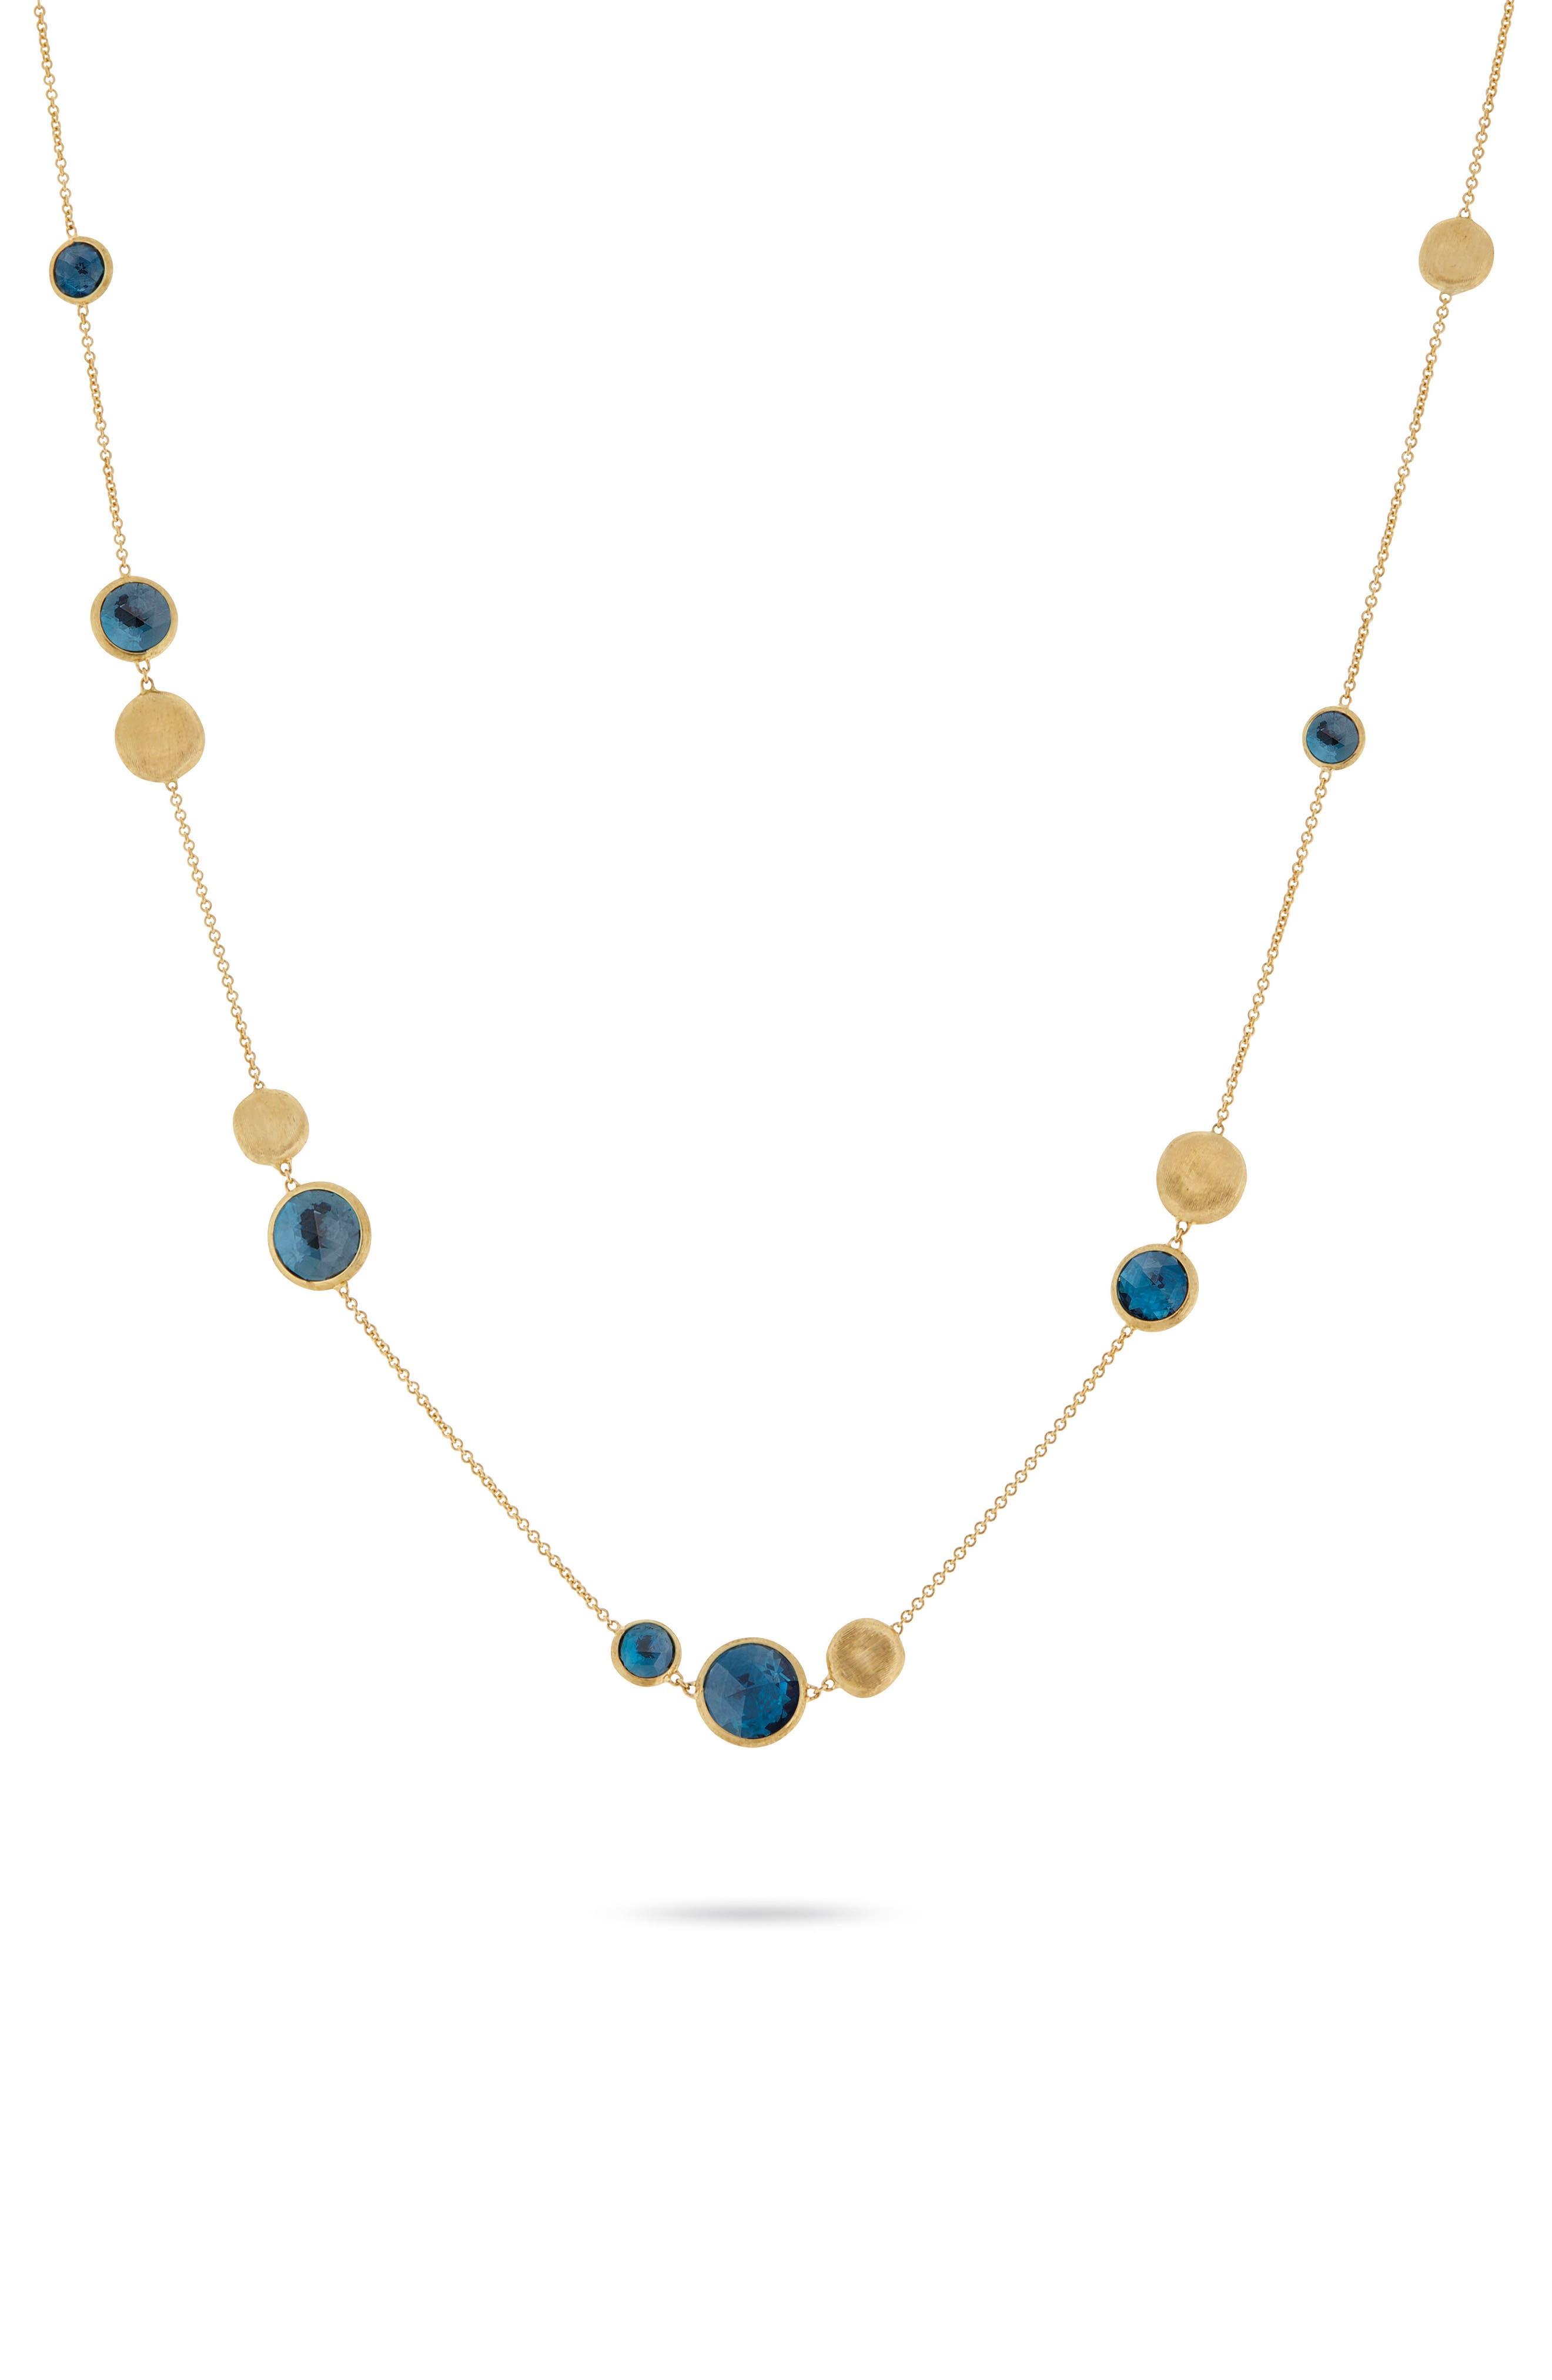 Marco Biecego Jaipur Semiprecious Stone Necklace